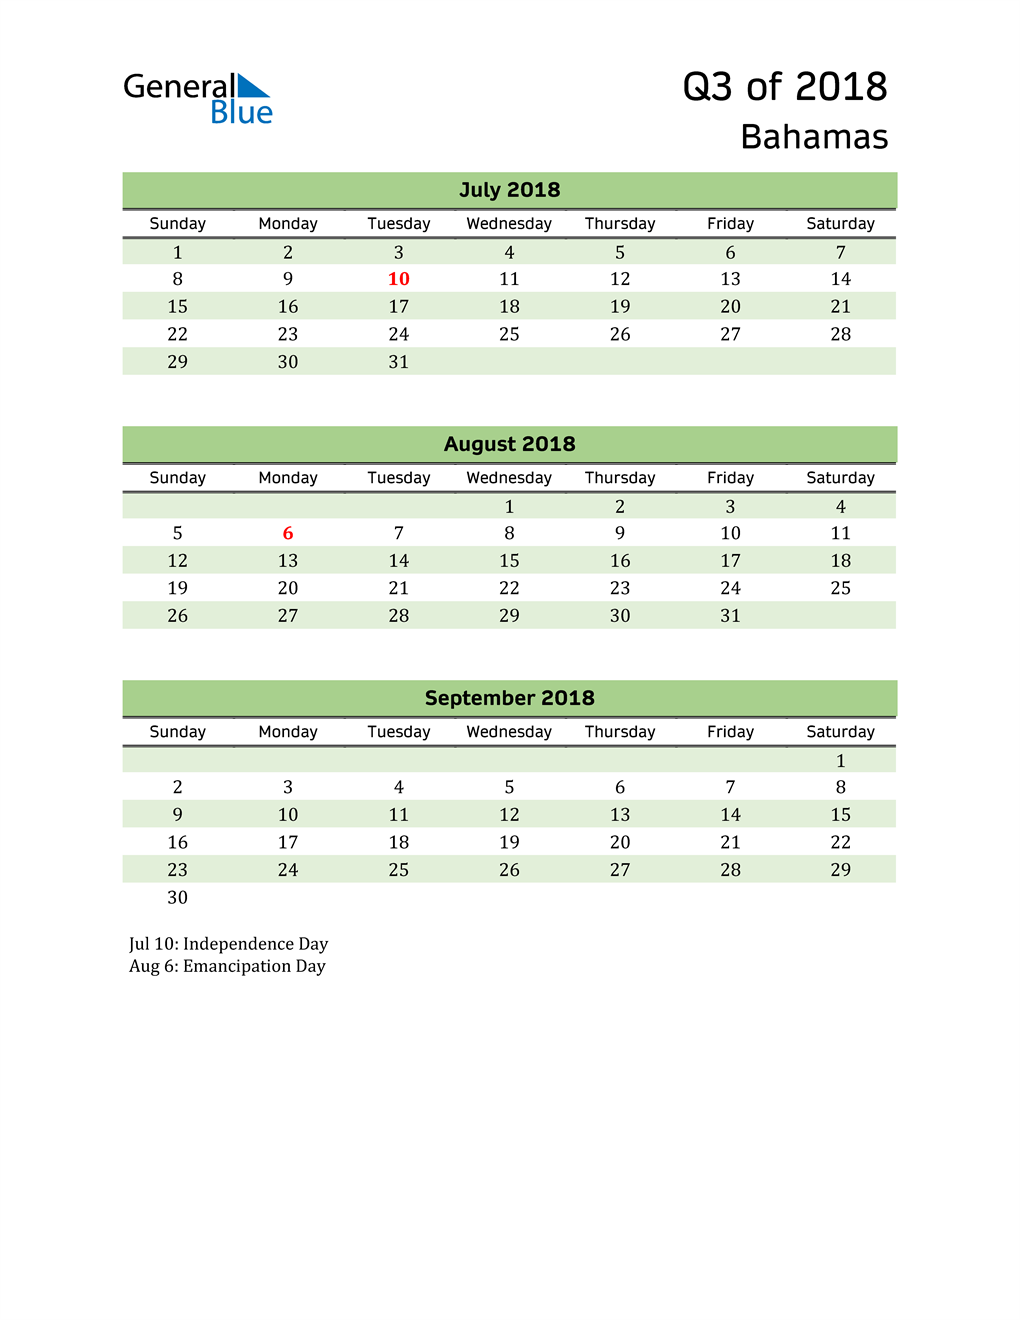 Quarterly Calendar 2018 with Bahamas Holidays